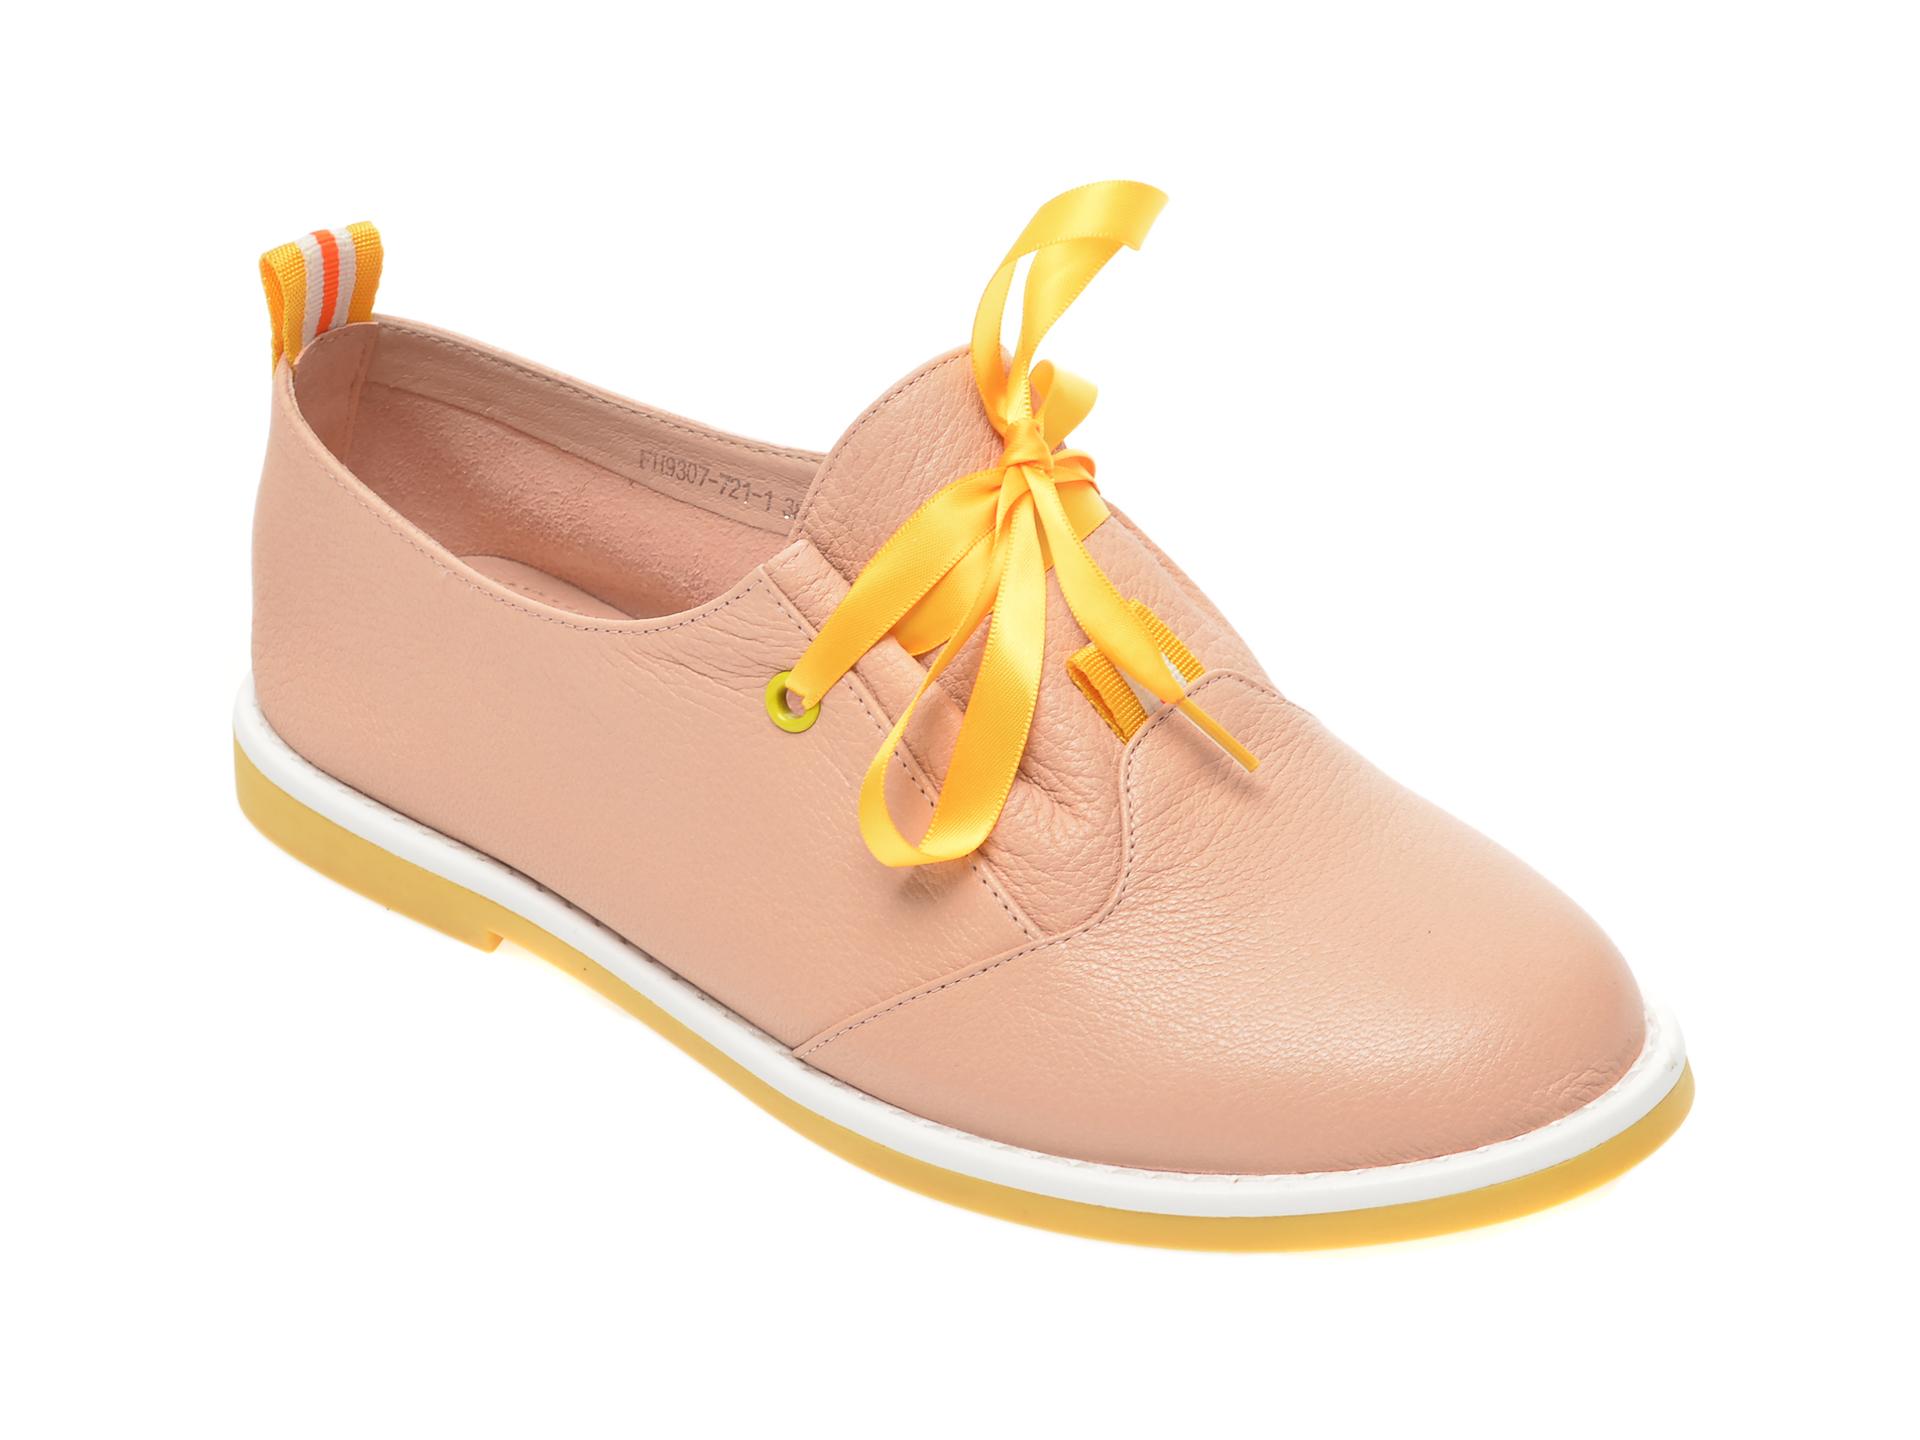 Pantofi FLAVIA PASSINI nude, FH93077, din piele naturala imagine